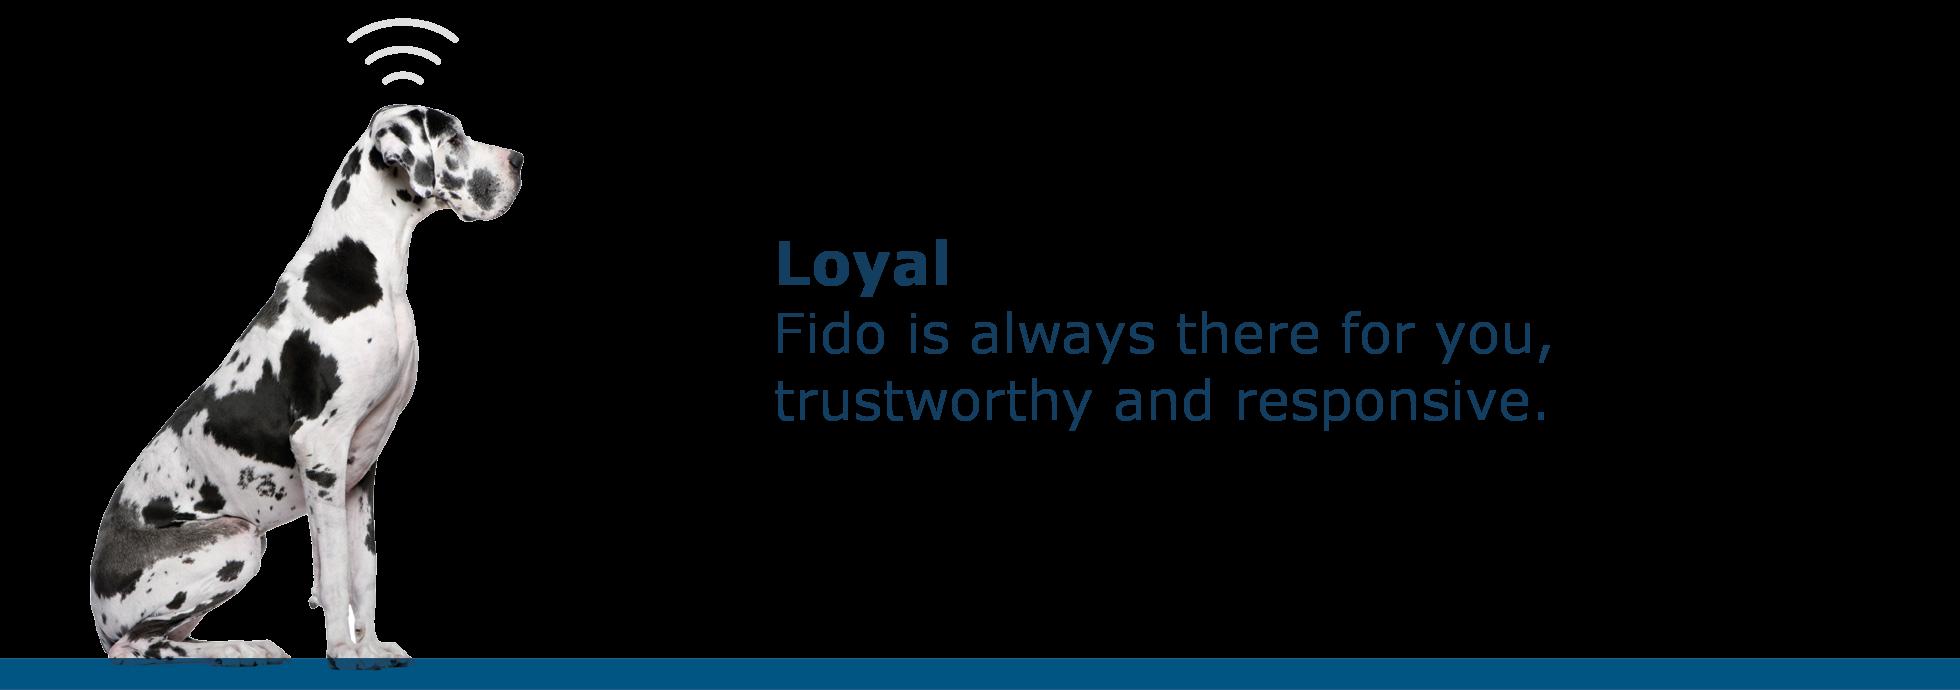 loyal.png